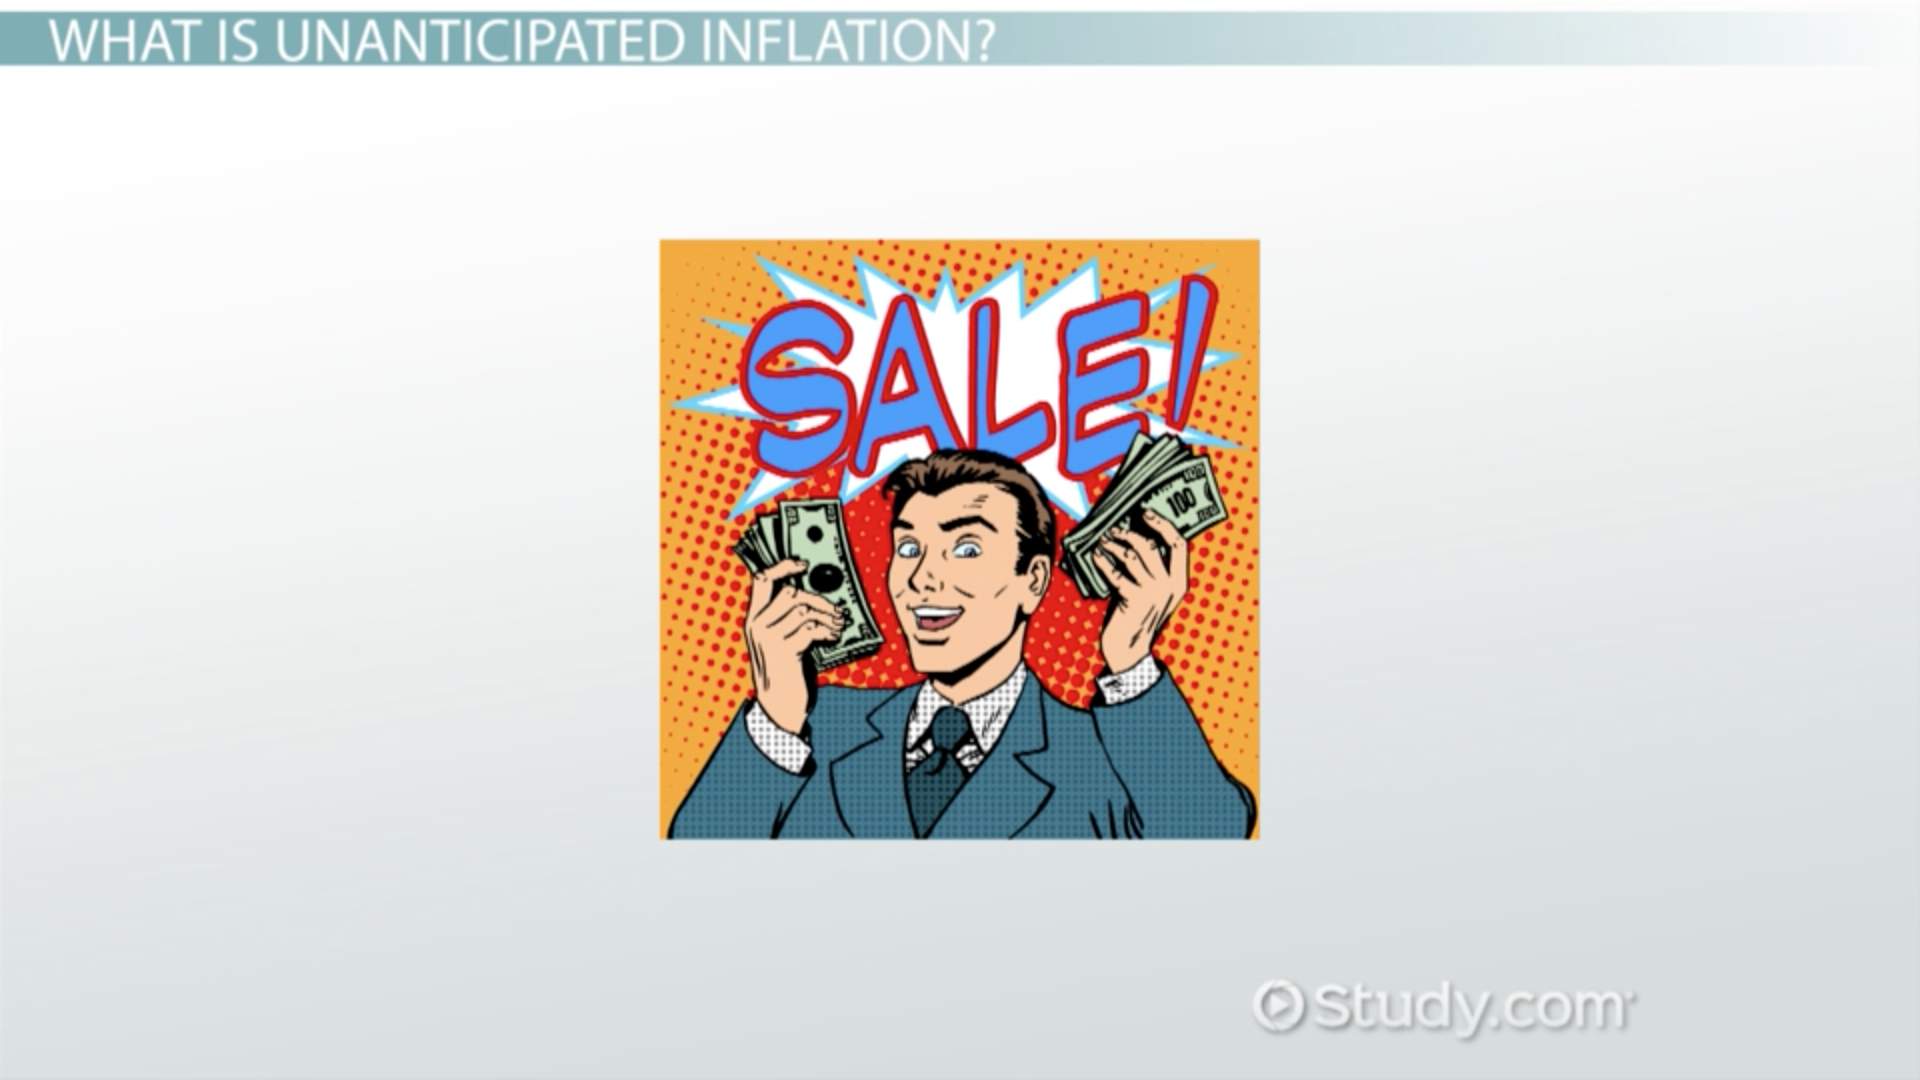 Resume inflation definition